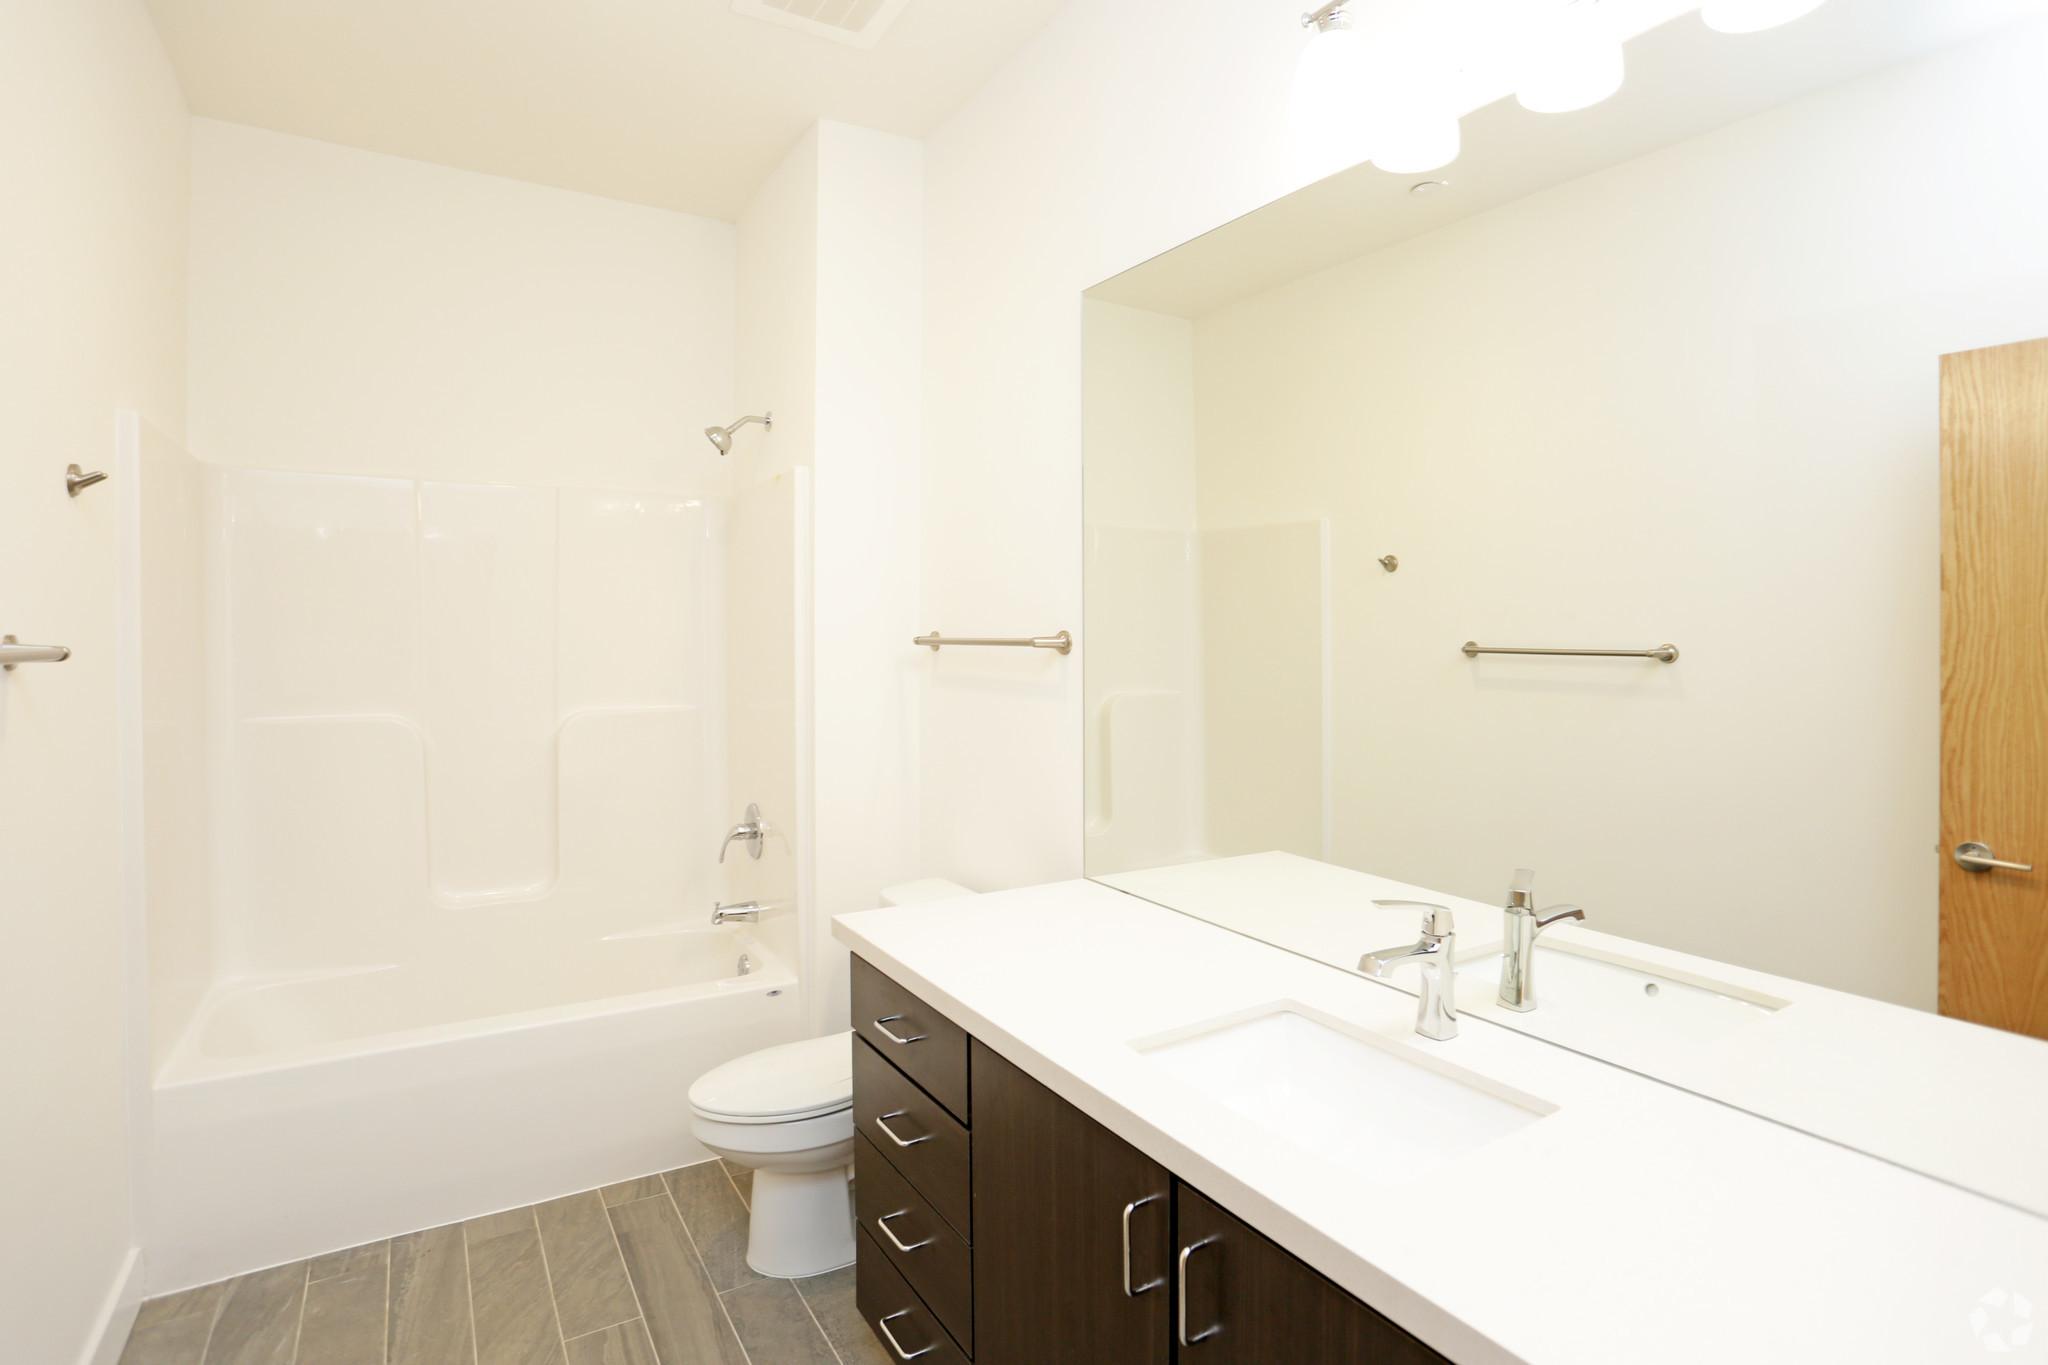 blackstone-depot-omaha-ne-bathroom.jpg